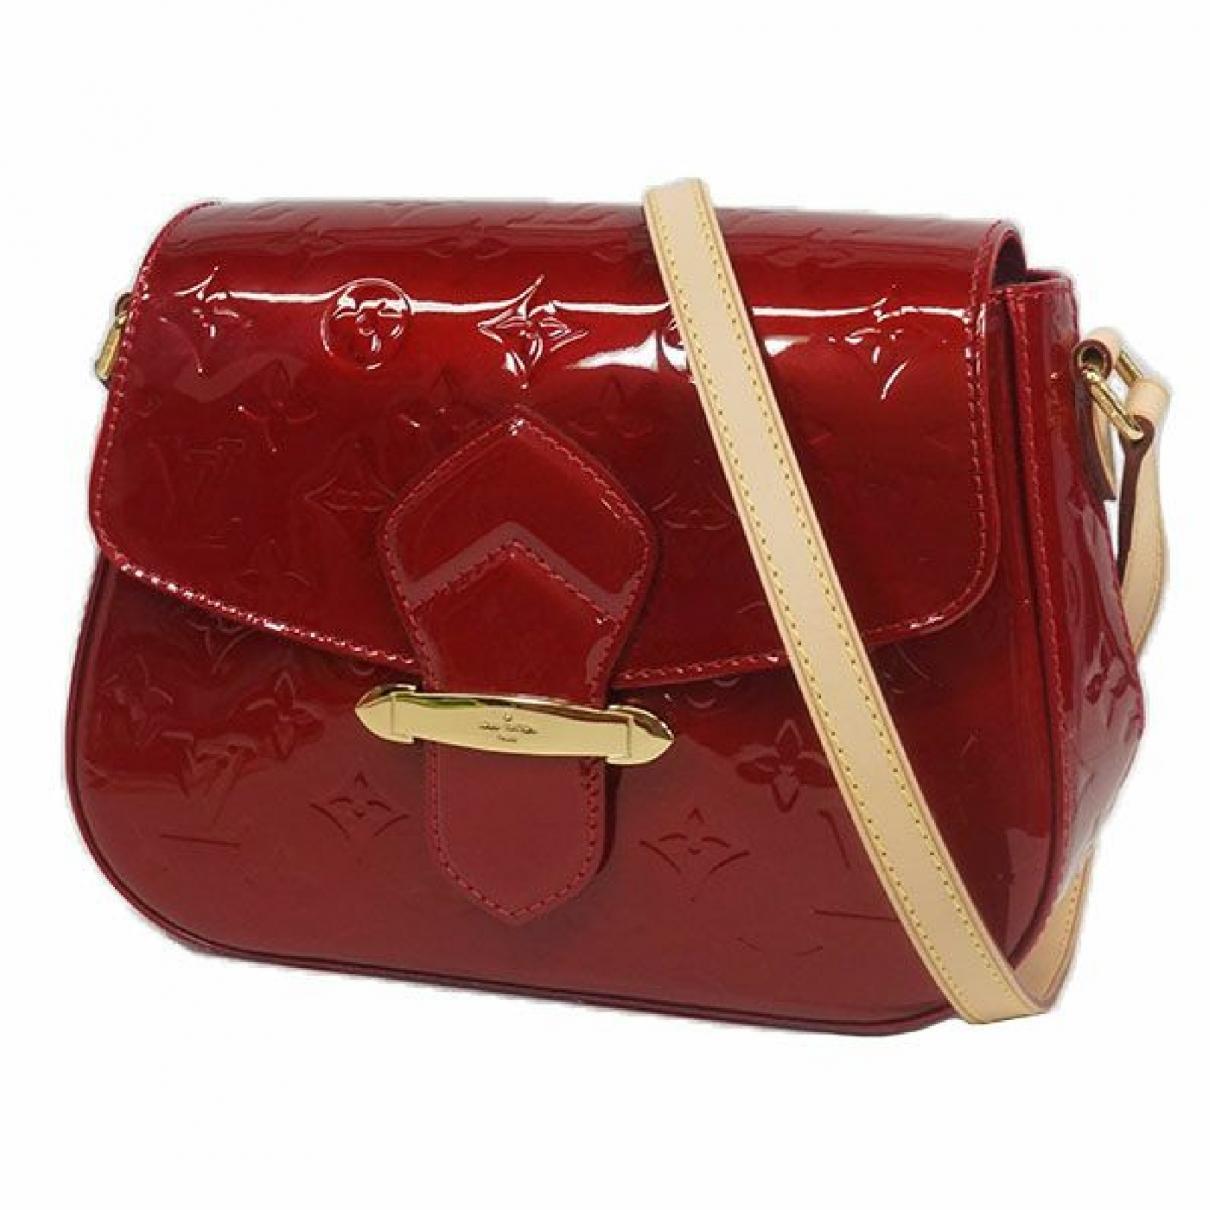 Louis Vuitton \N Red Leather handbag for Women \N